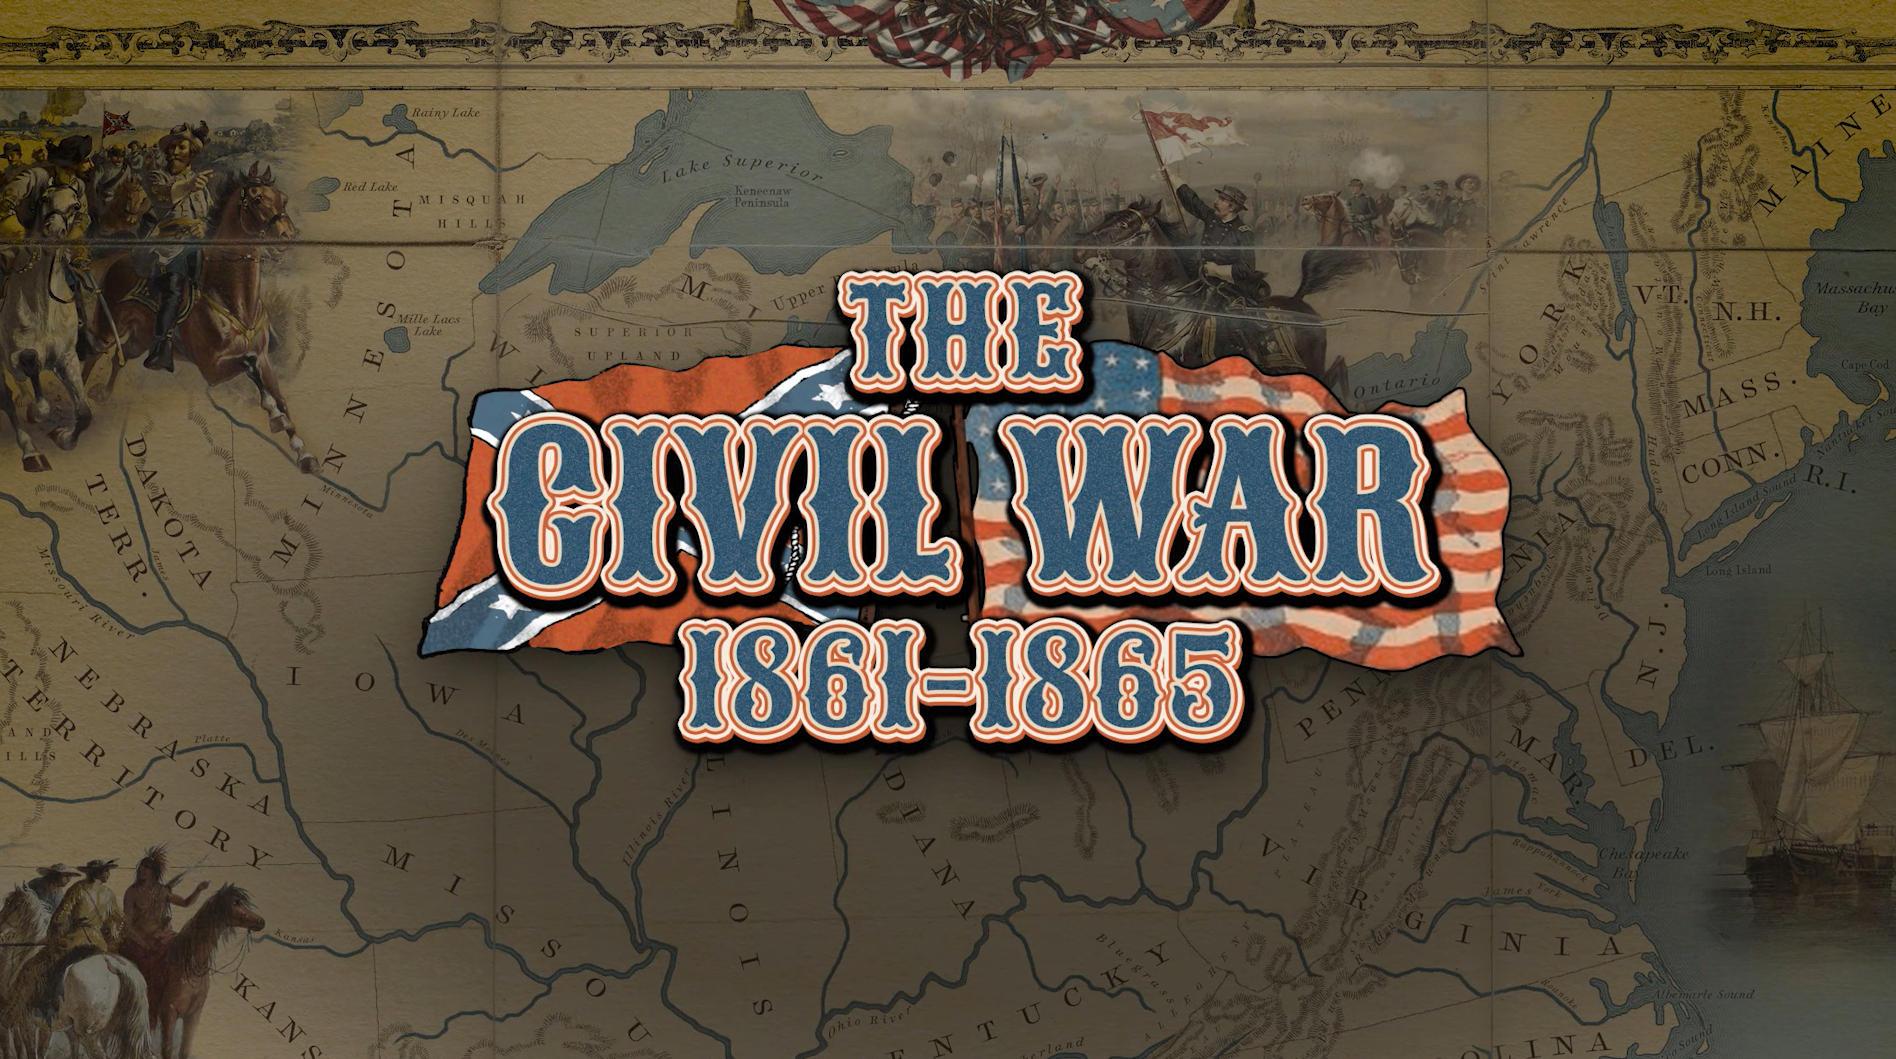 Grand Tactician The Civil War (1861-1865) Free Download